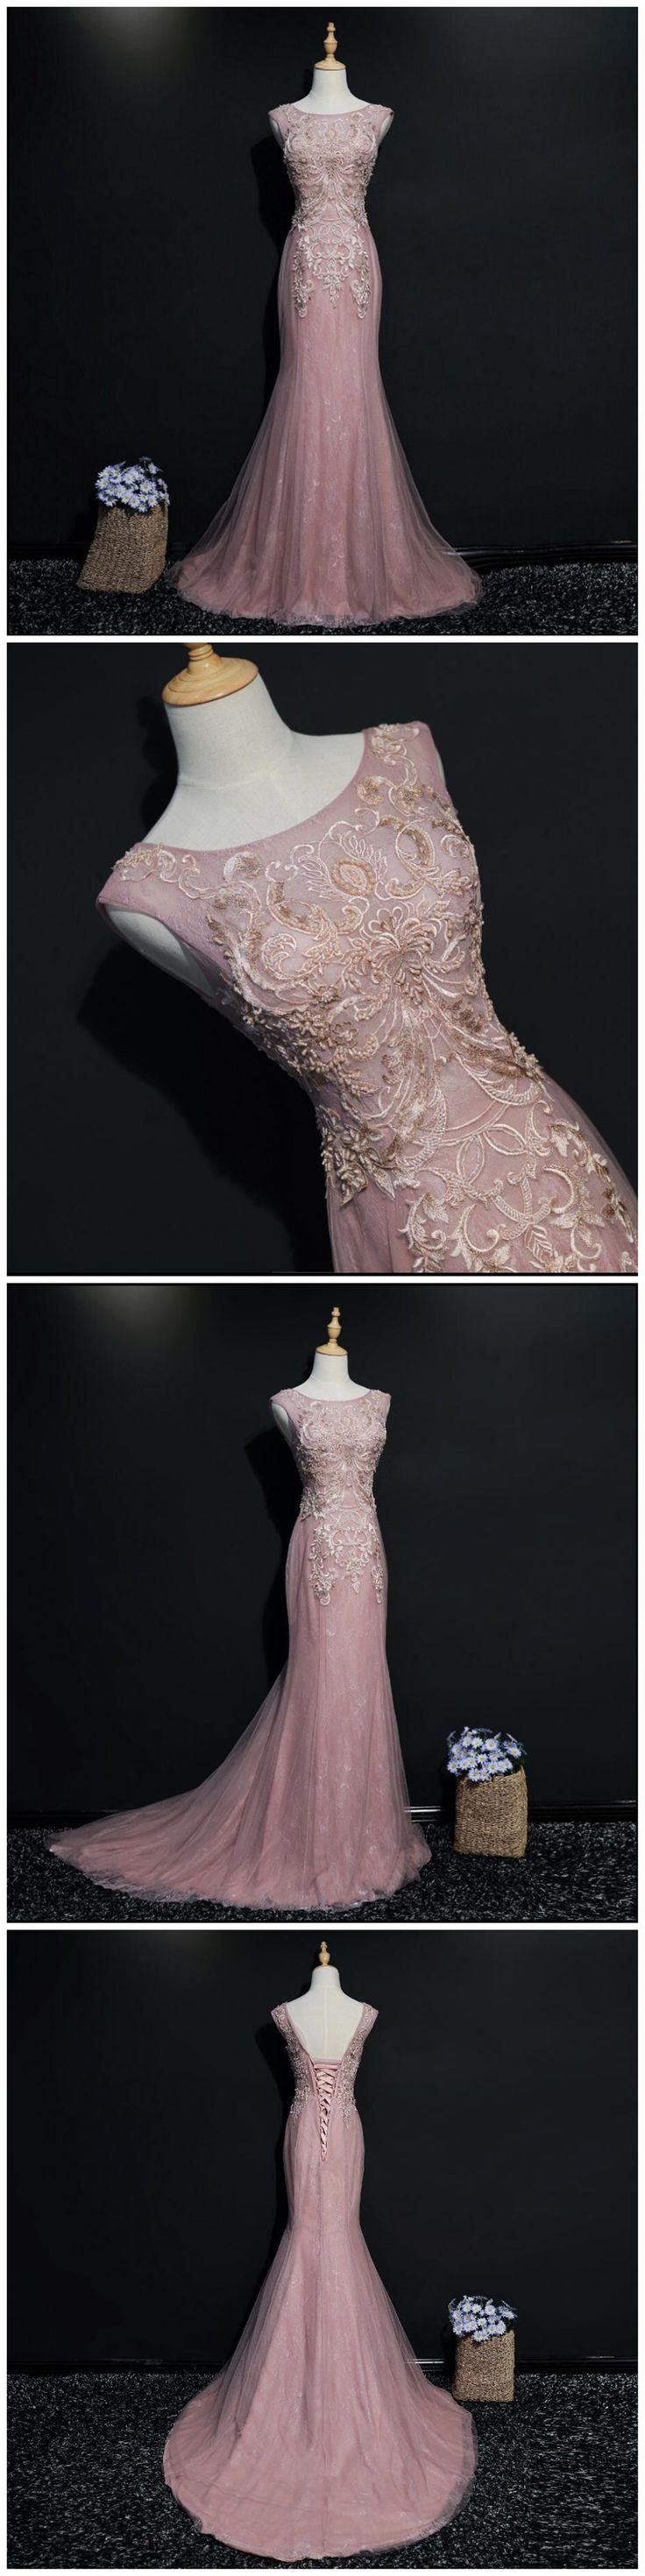 Lace Mermaid Cap Sleeve Scoop Neckline Unique Long Evening Prom Dresses, Popular 2018 Party Prom Dresses, Custom Long Prom Dresses, Cheap Formal Prom Dresses, 17217